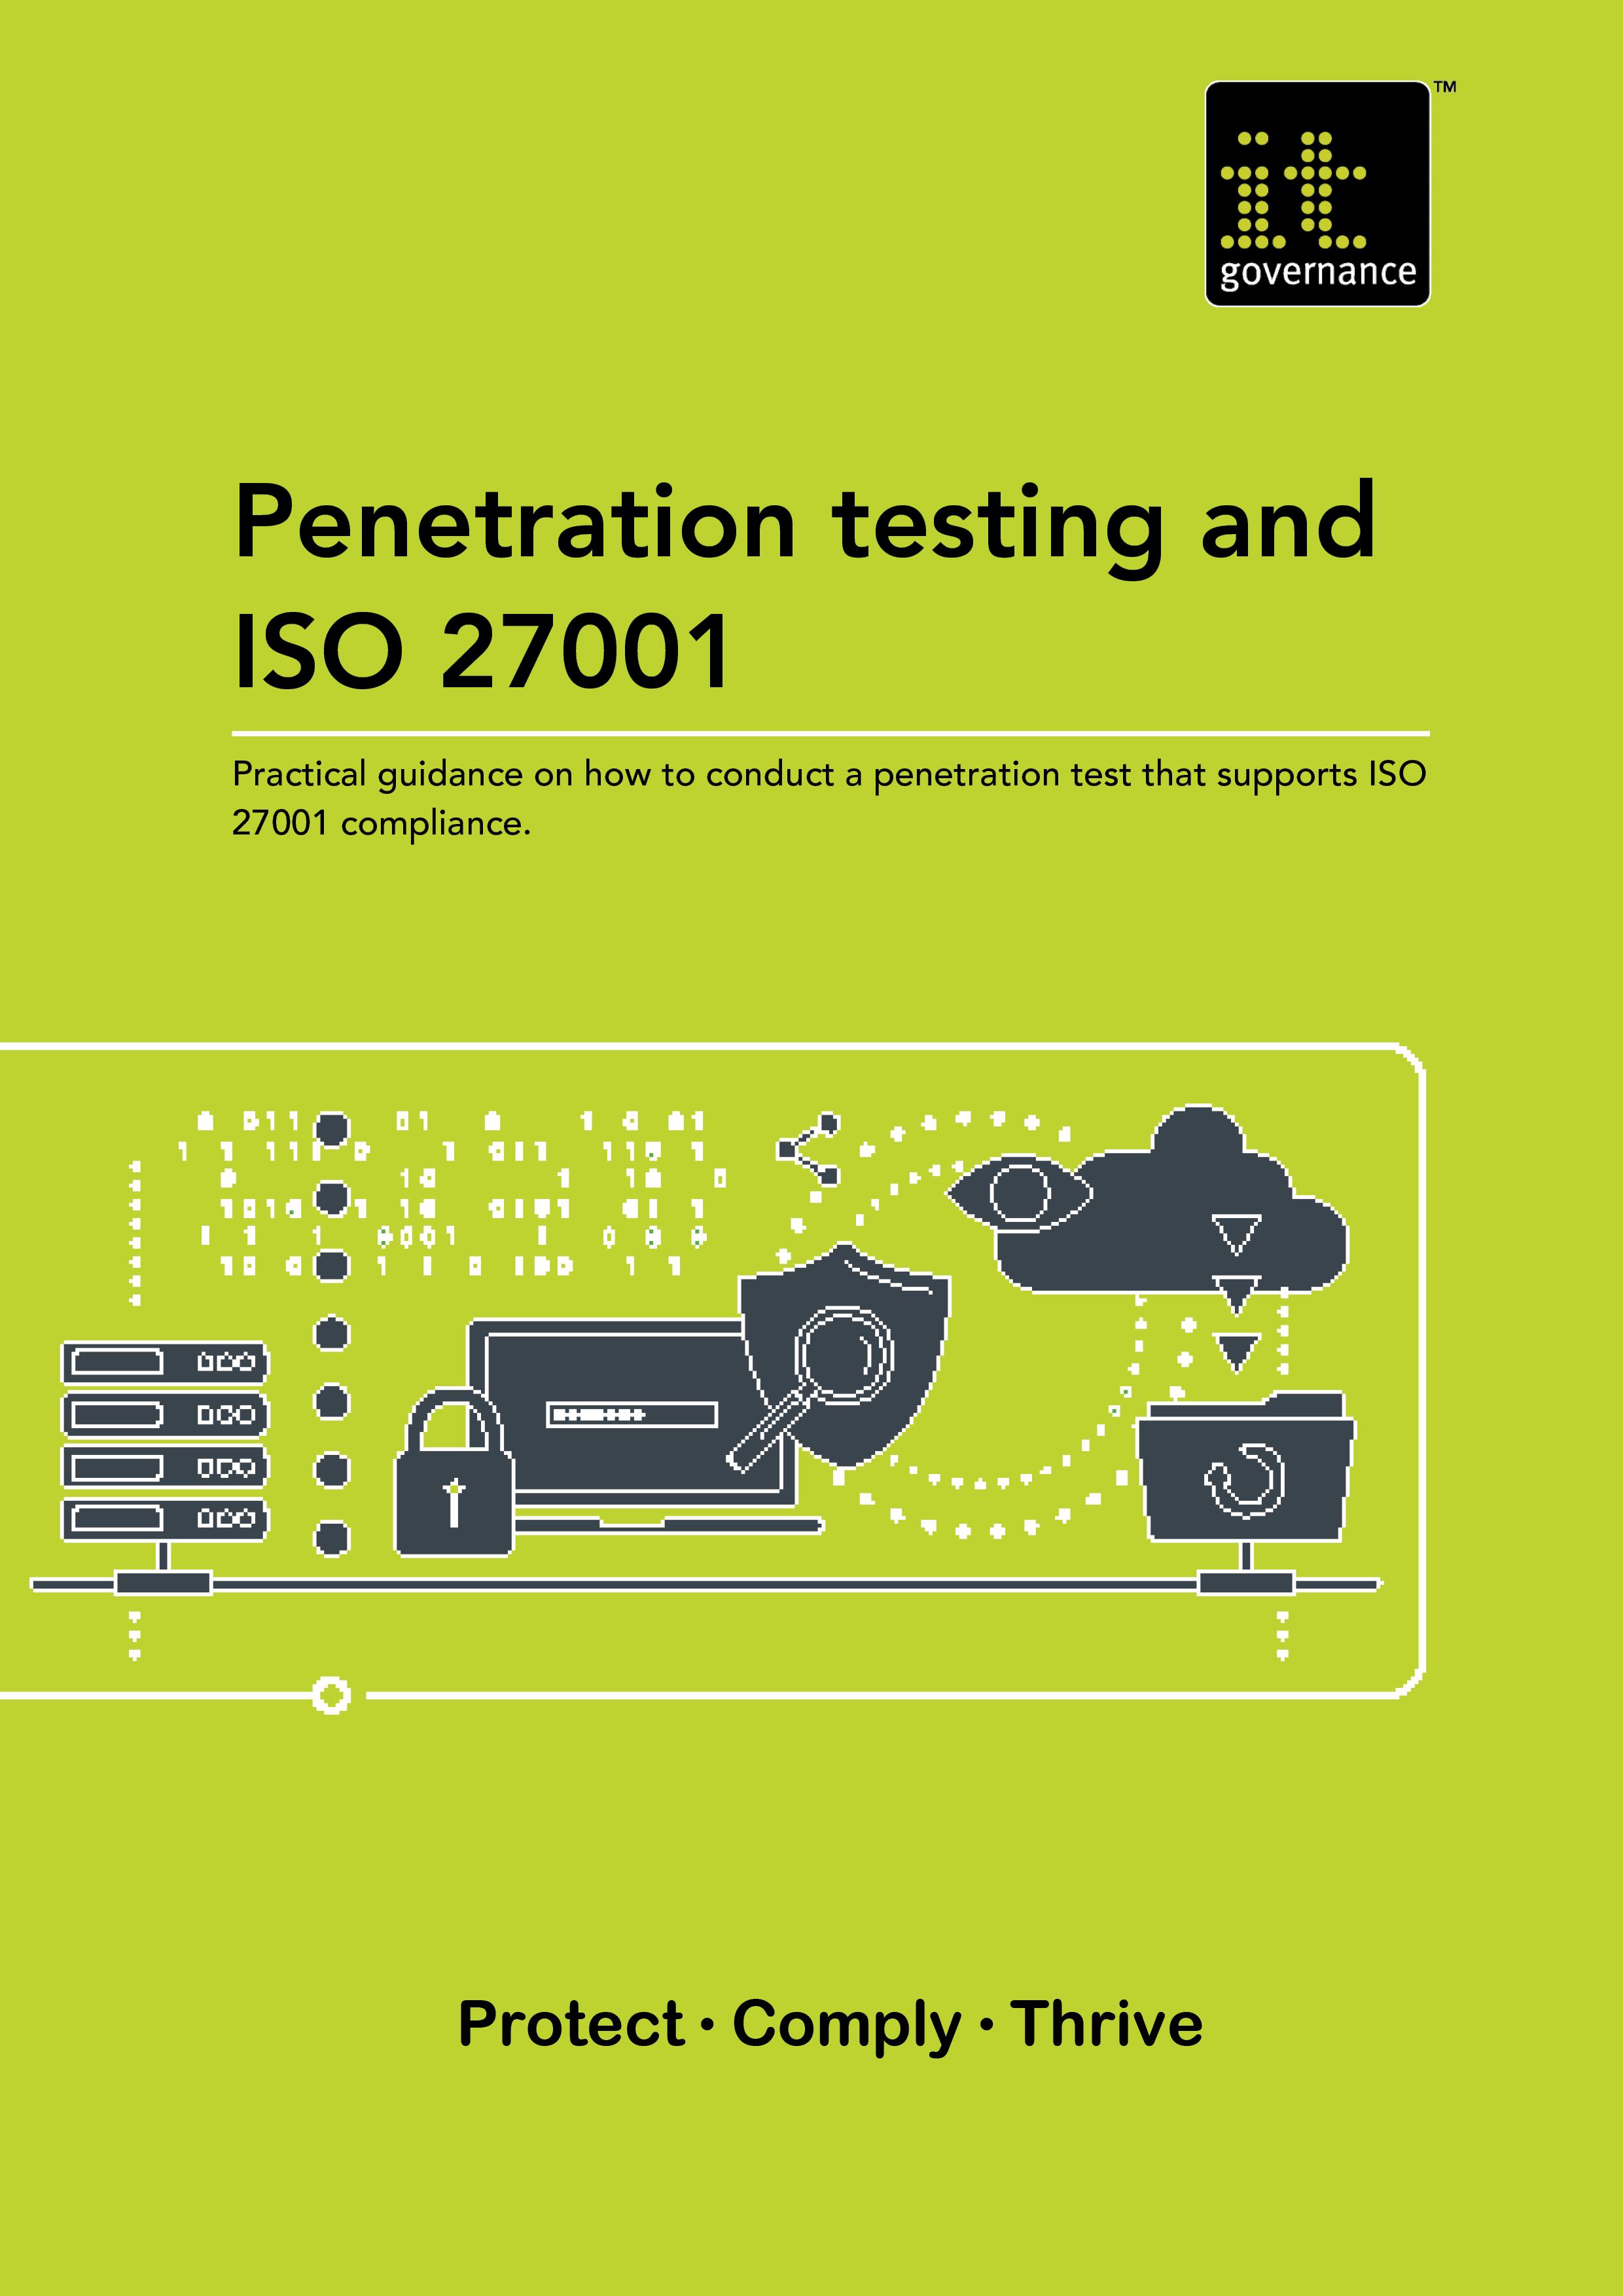 bids-for-penetration-testing